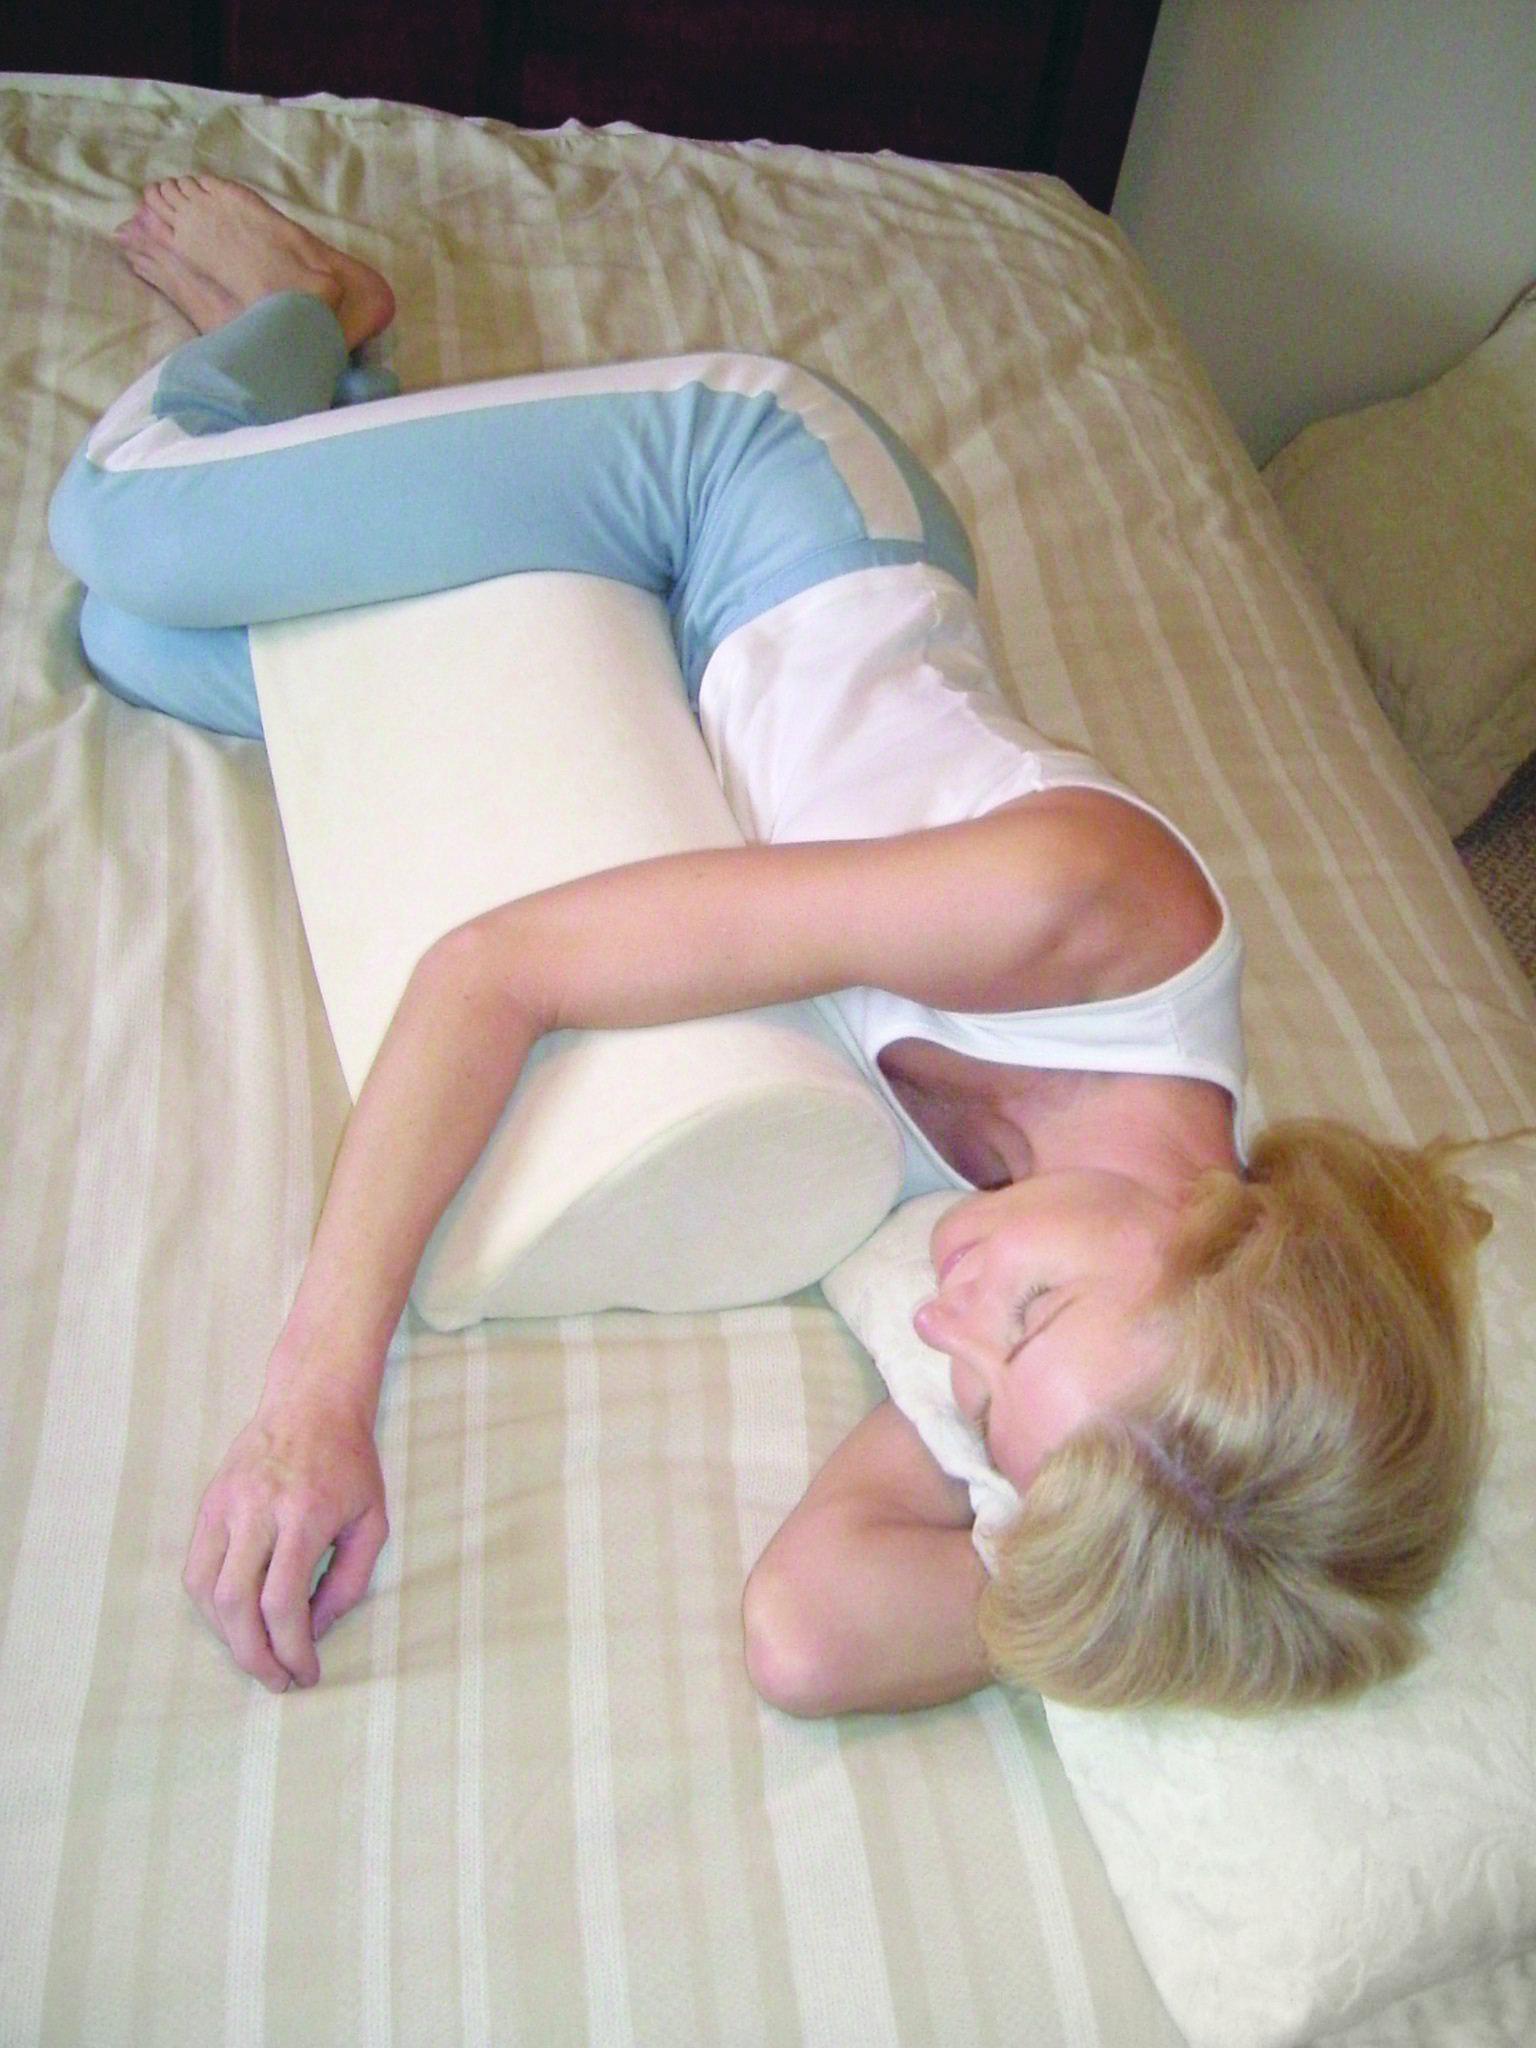 stomach sleepers teardrop body